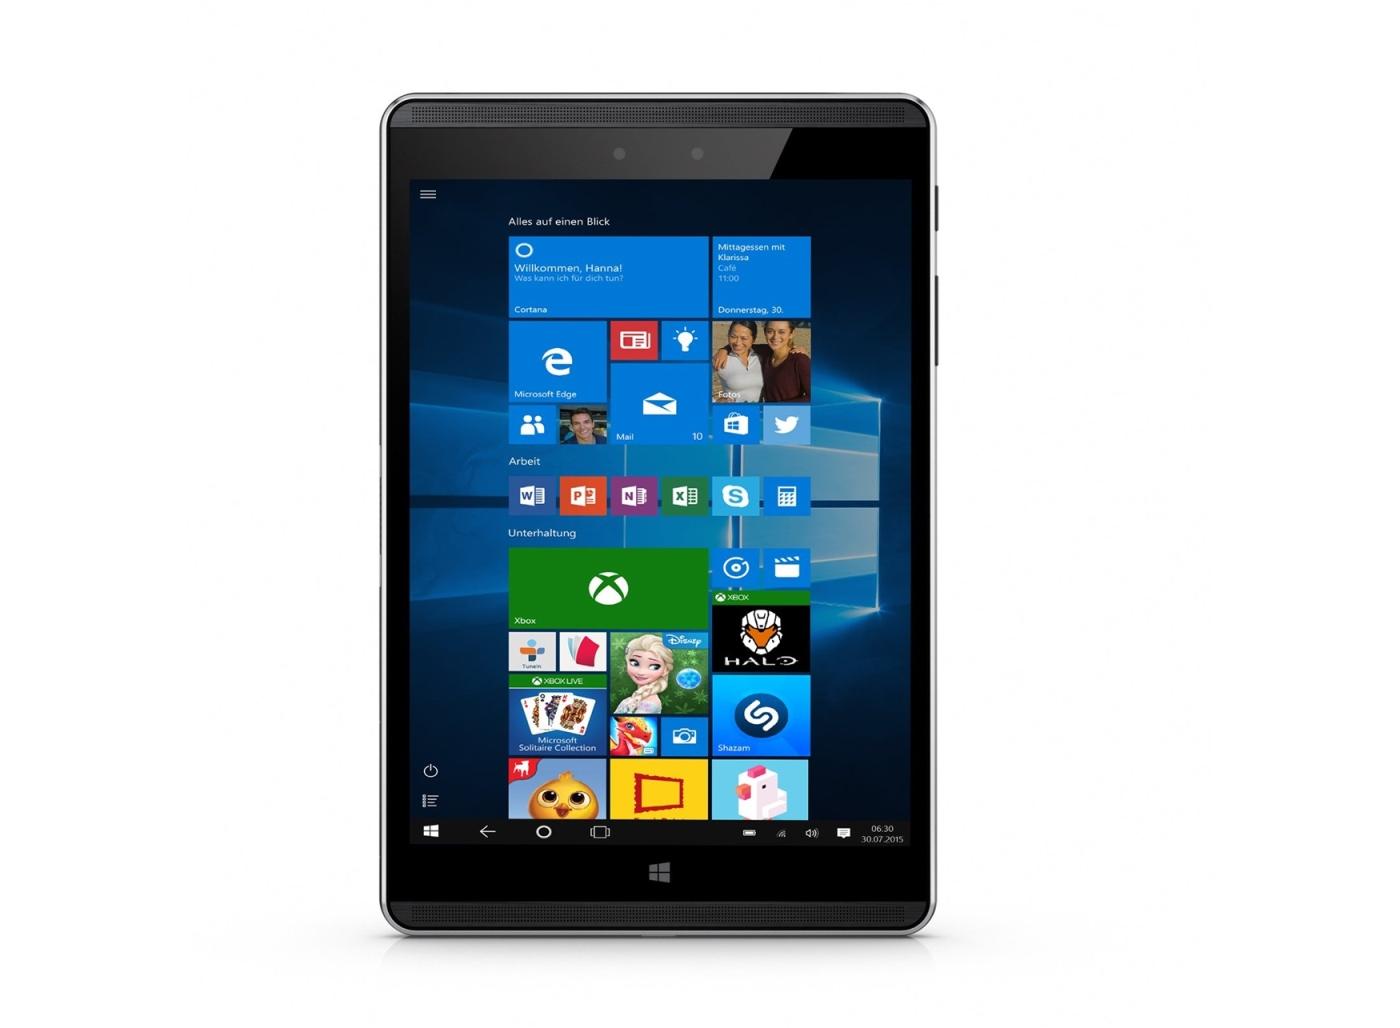 "HP Pro Tablet 608 G1 Z8550 7.86"" QXGA (2048x1536), 4GB, 64GB, ac, BT, NFC, Win 10 Pro"